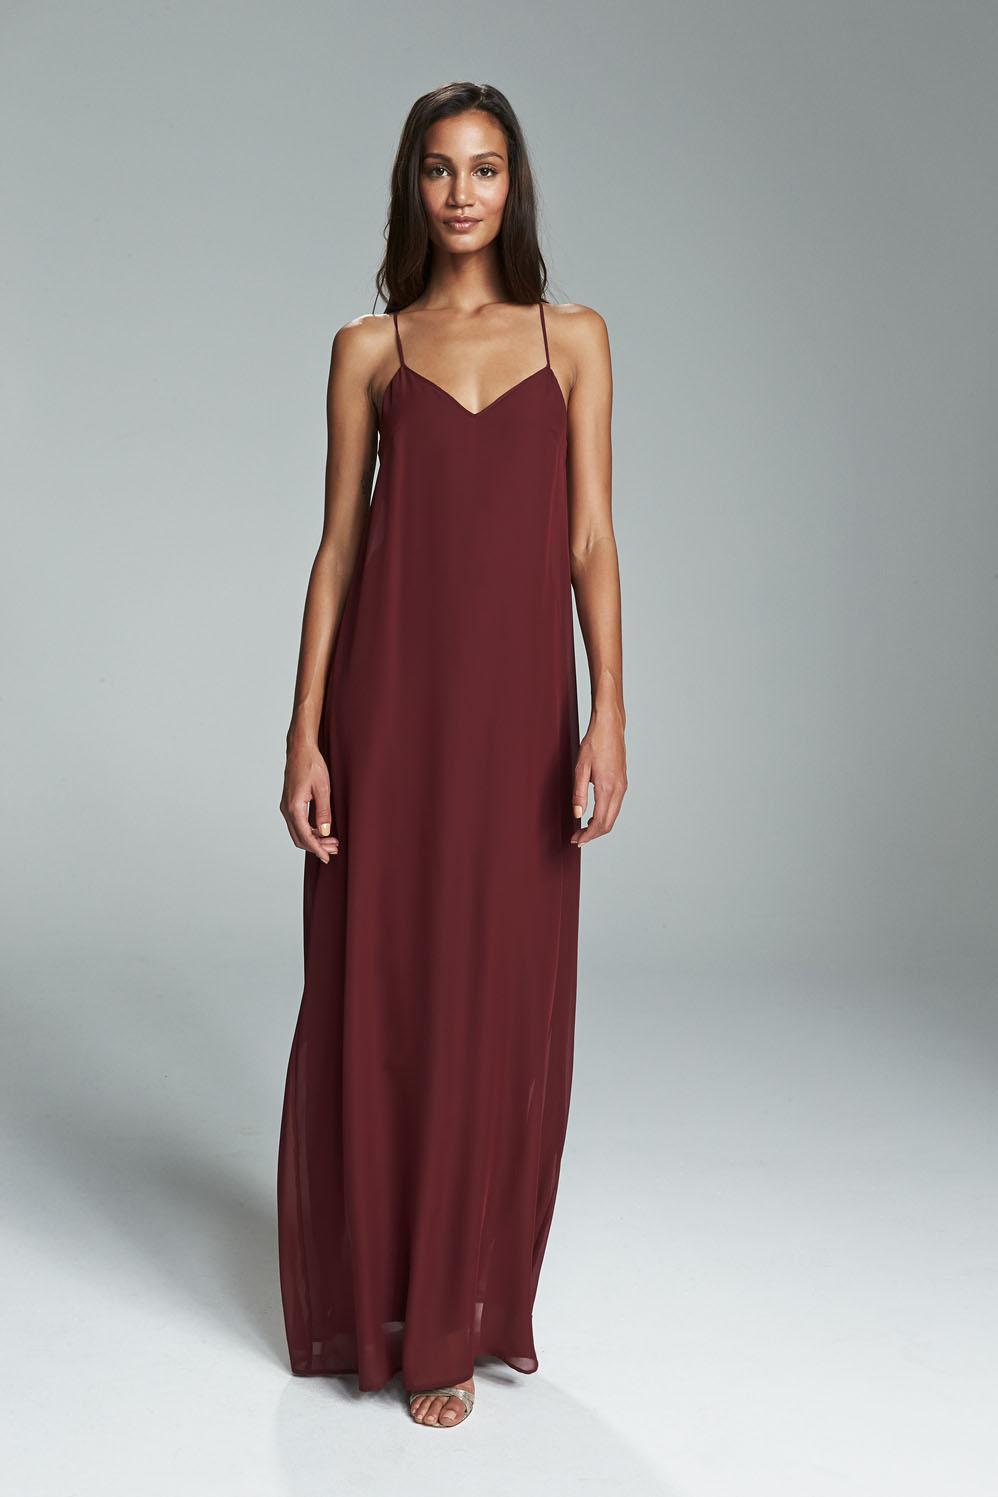 Long-flowy-bridesmaid-dress-nouvelle-amsale-bridesmaids-willa.jpg